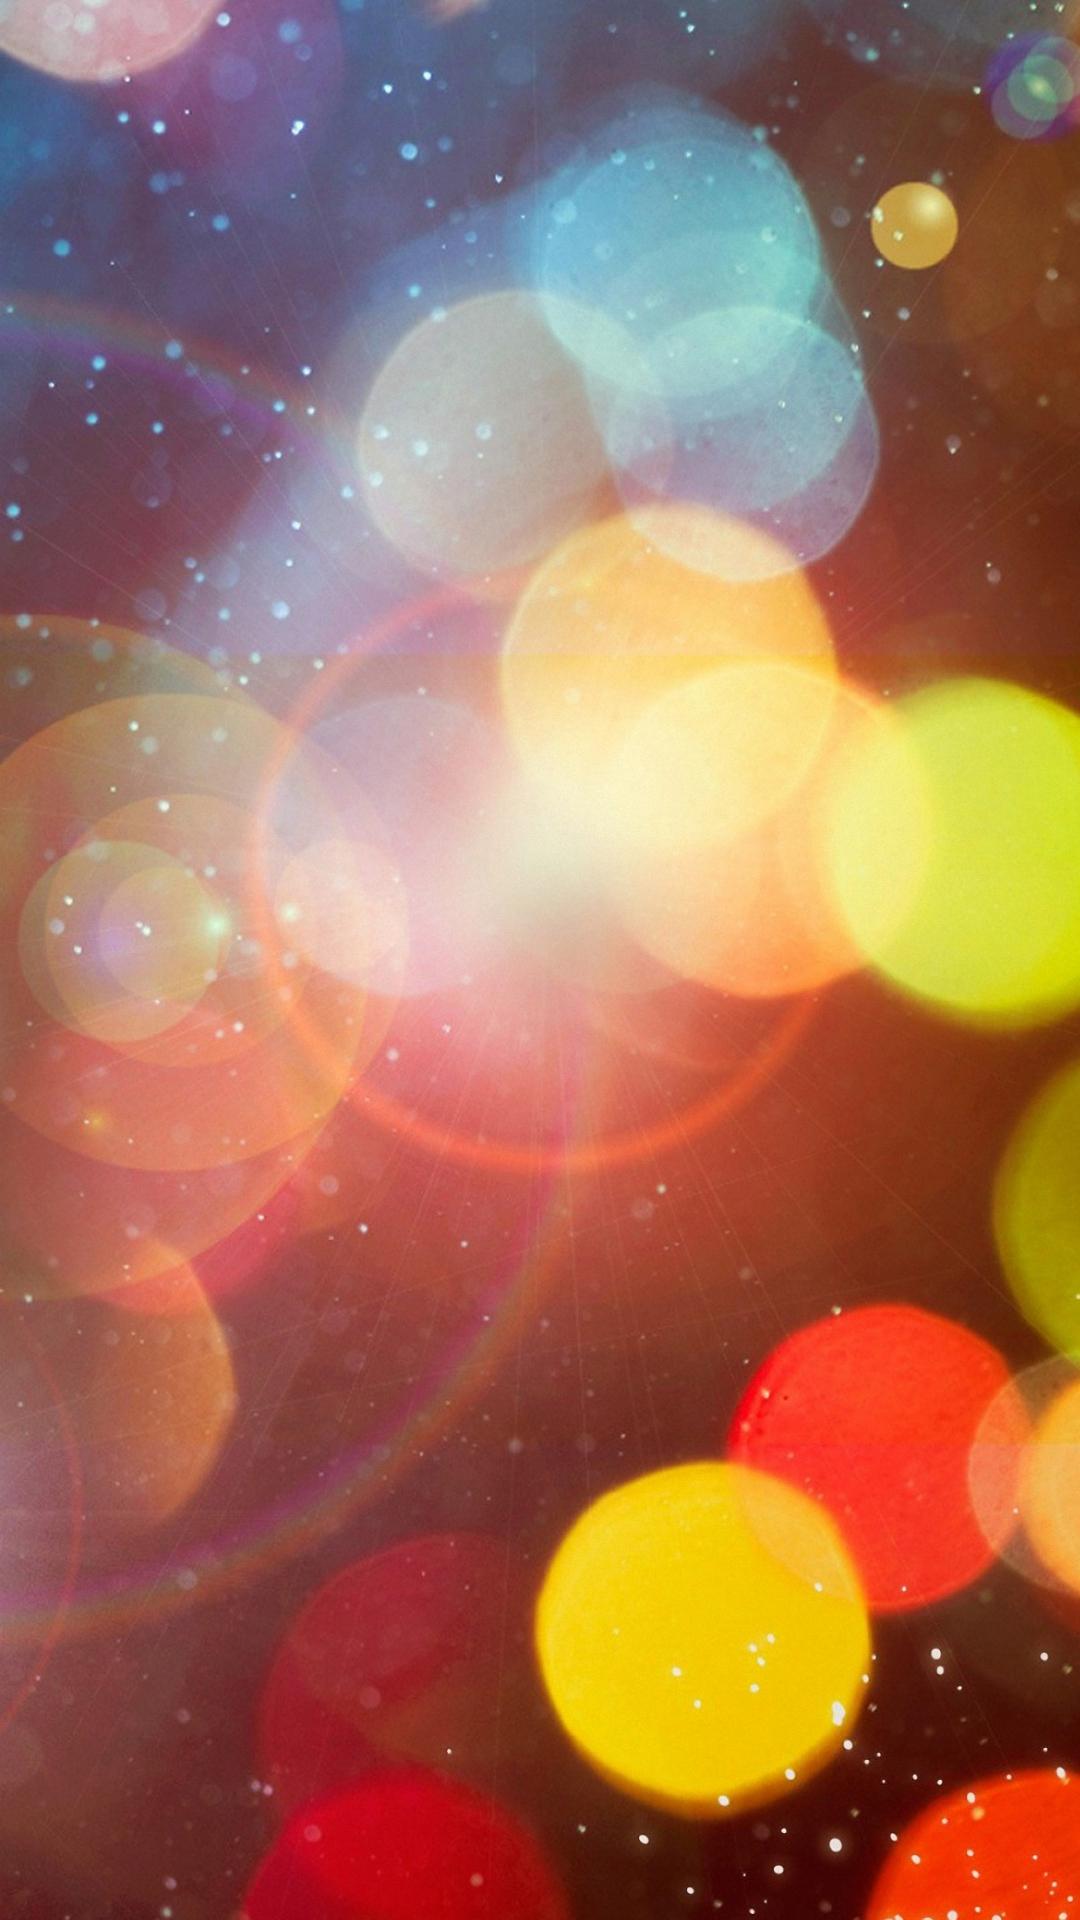 1080x1920 Pretty Colorful Circles Lights iphone 6s plus Wallpaper HD 1080x1920